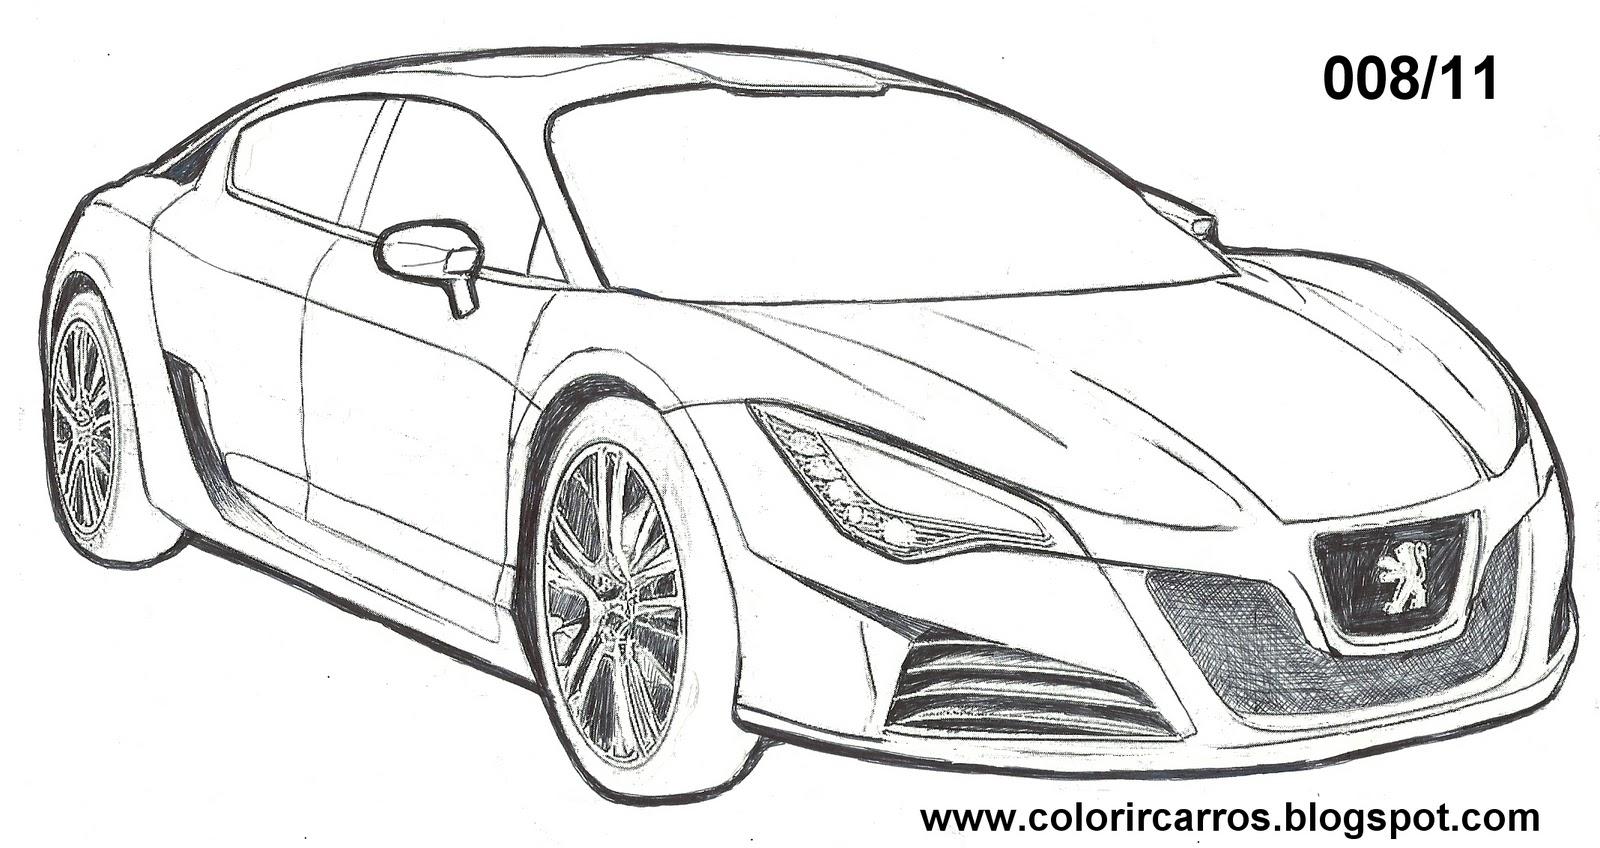 de PROFESSOR ADILSON - colorir carros: Março 2011